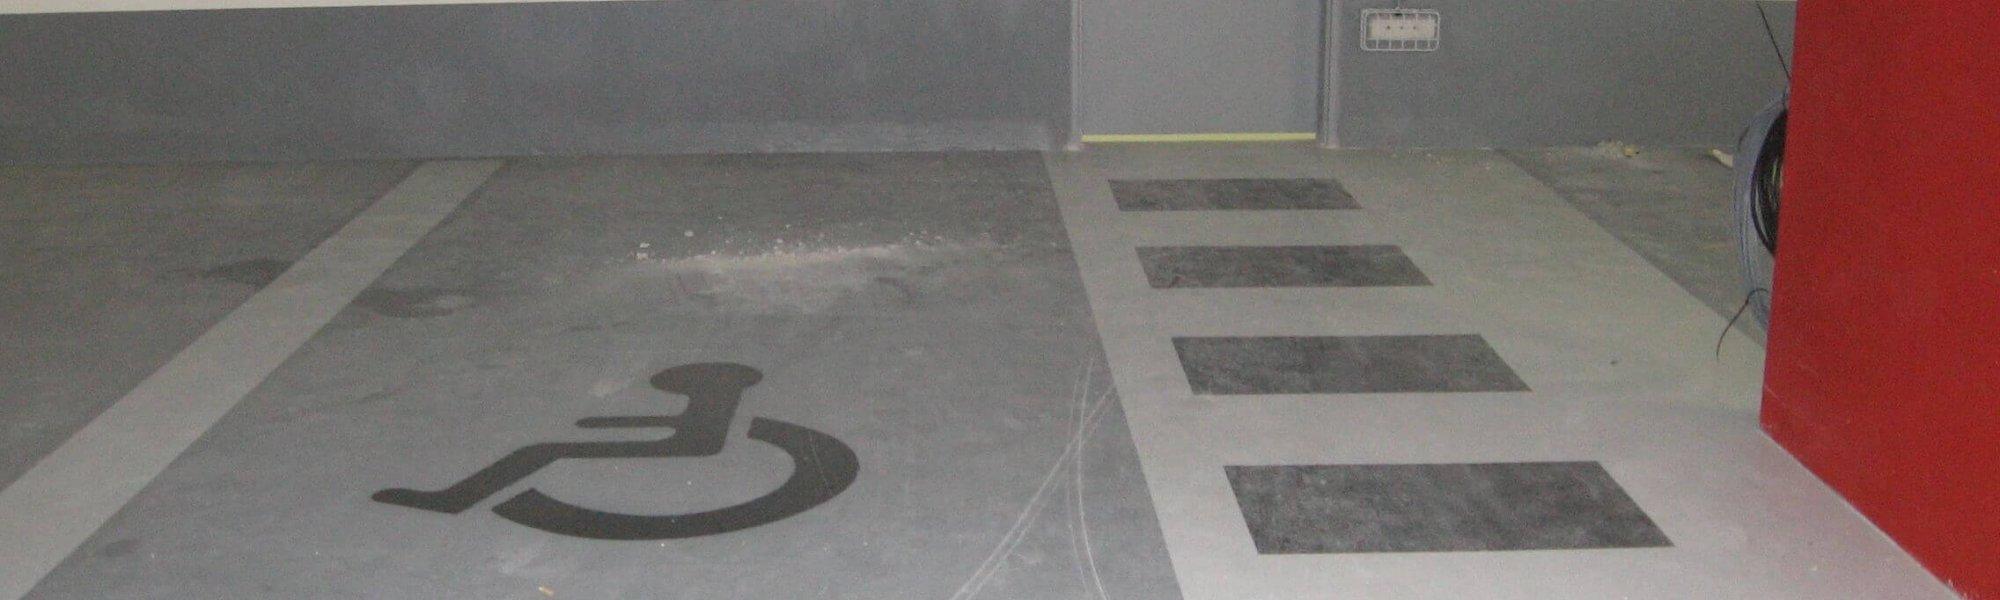 marquage au sol parking handicape